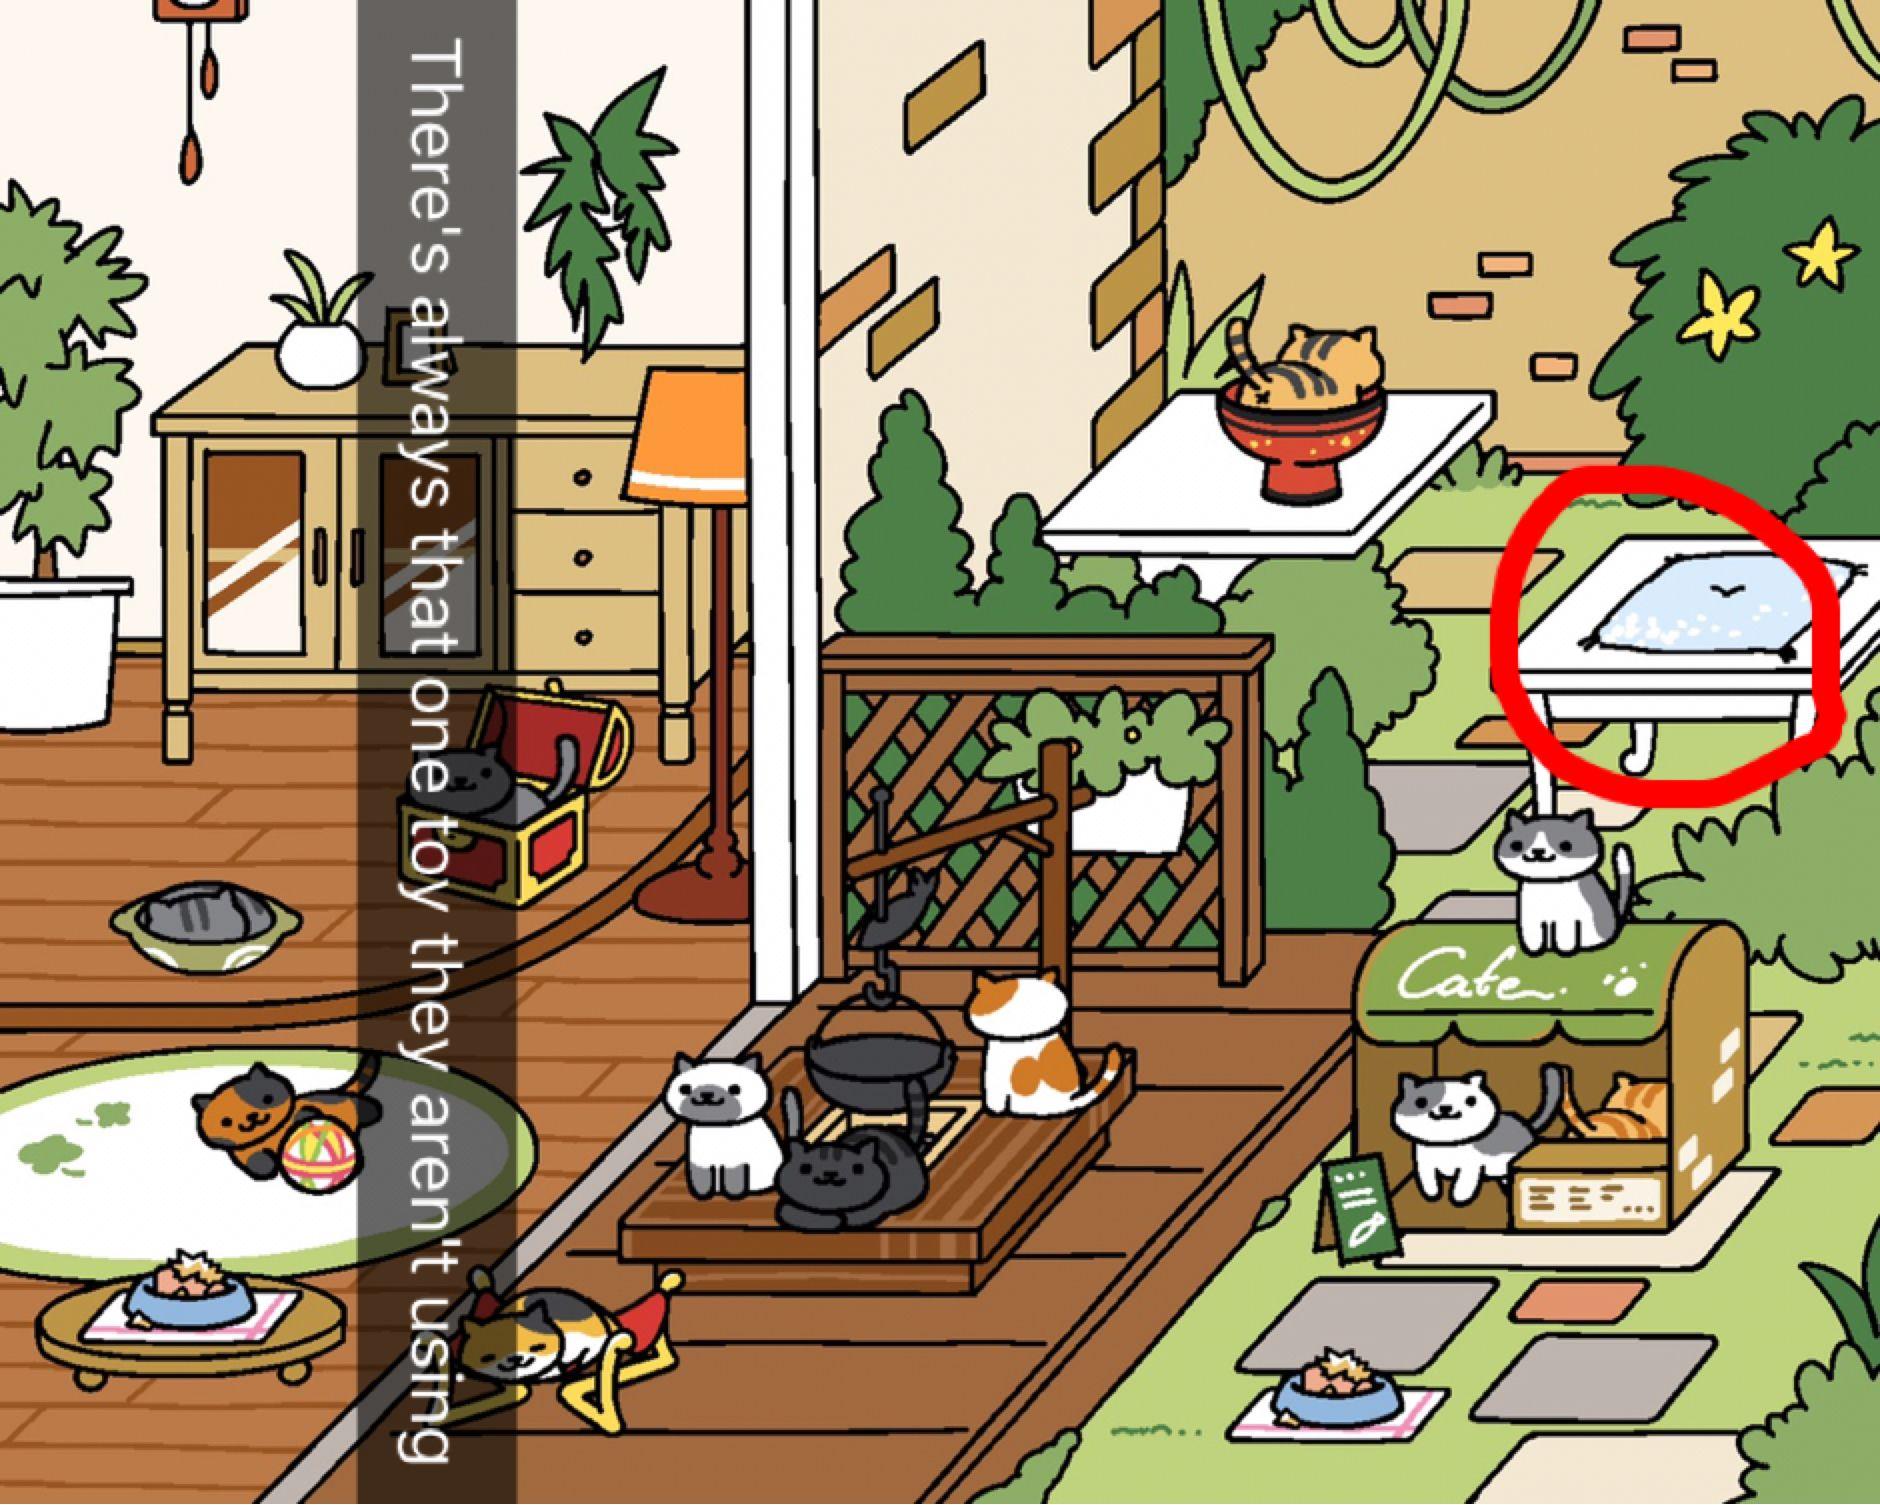 Pin By Melissa T On Cats Neko Atsume Japanese Cat Neko